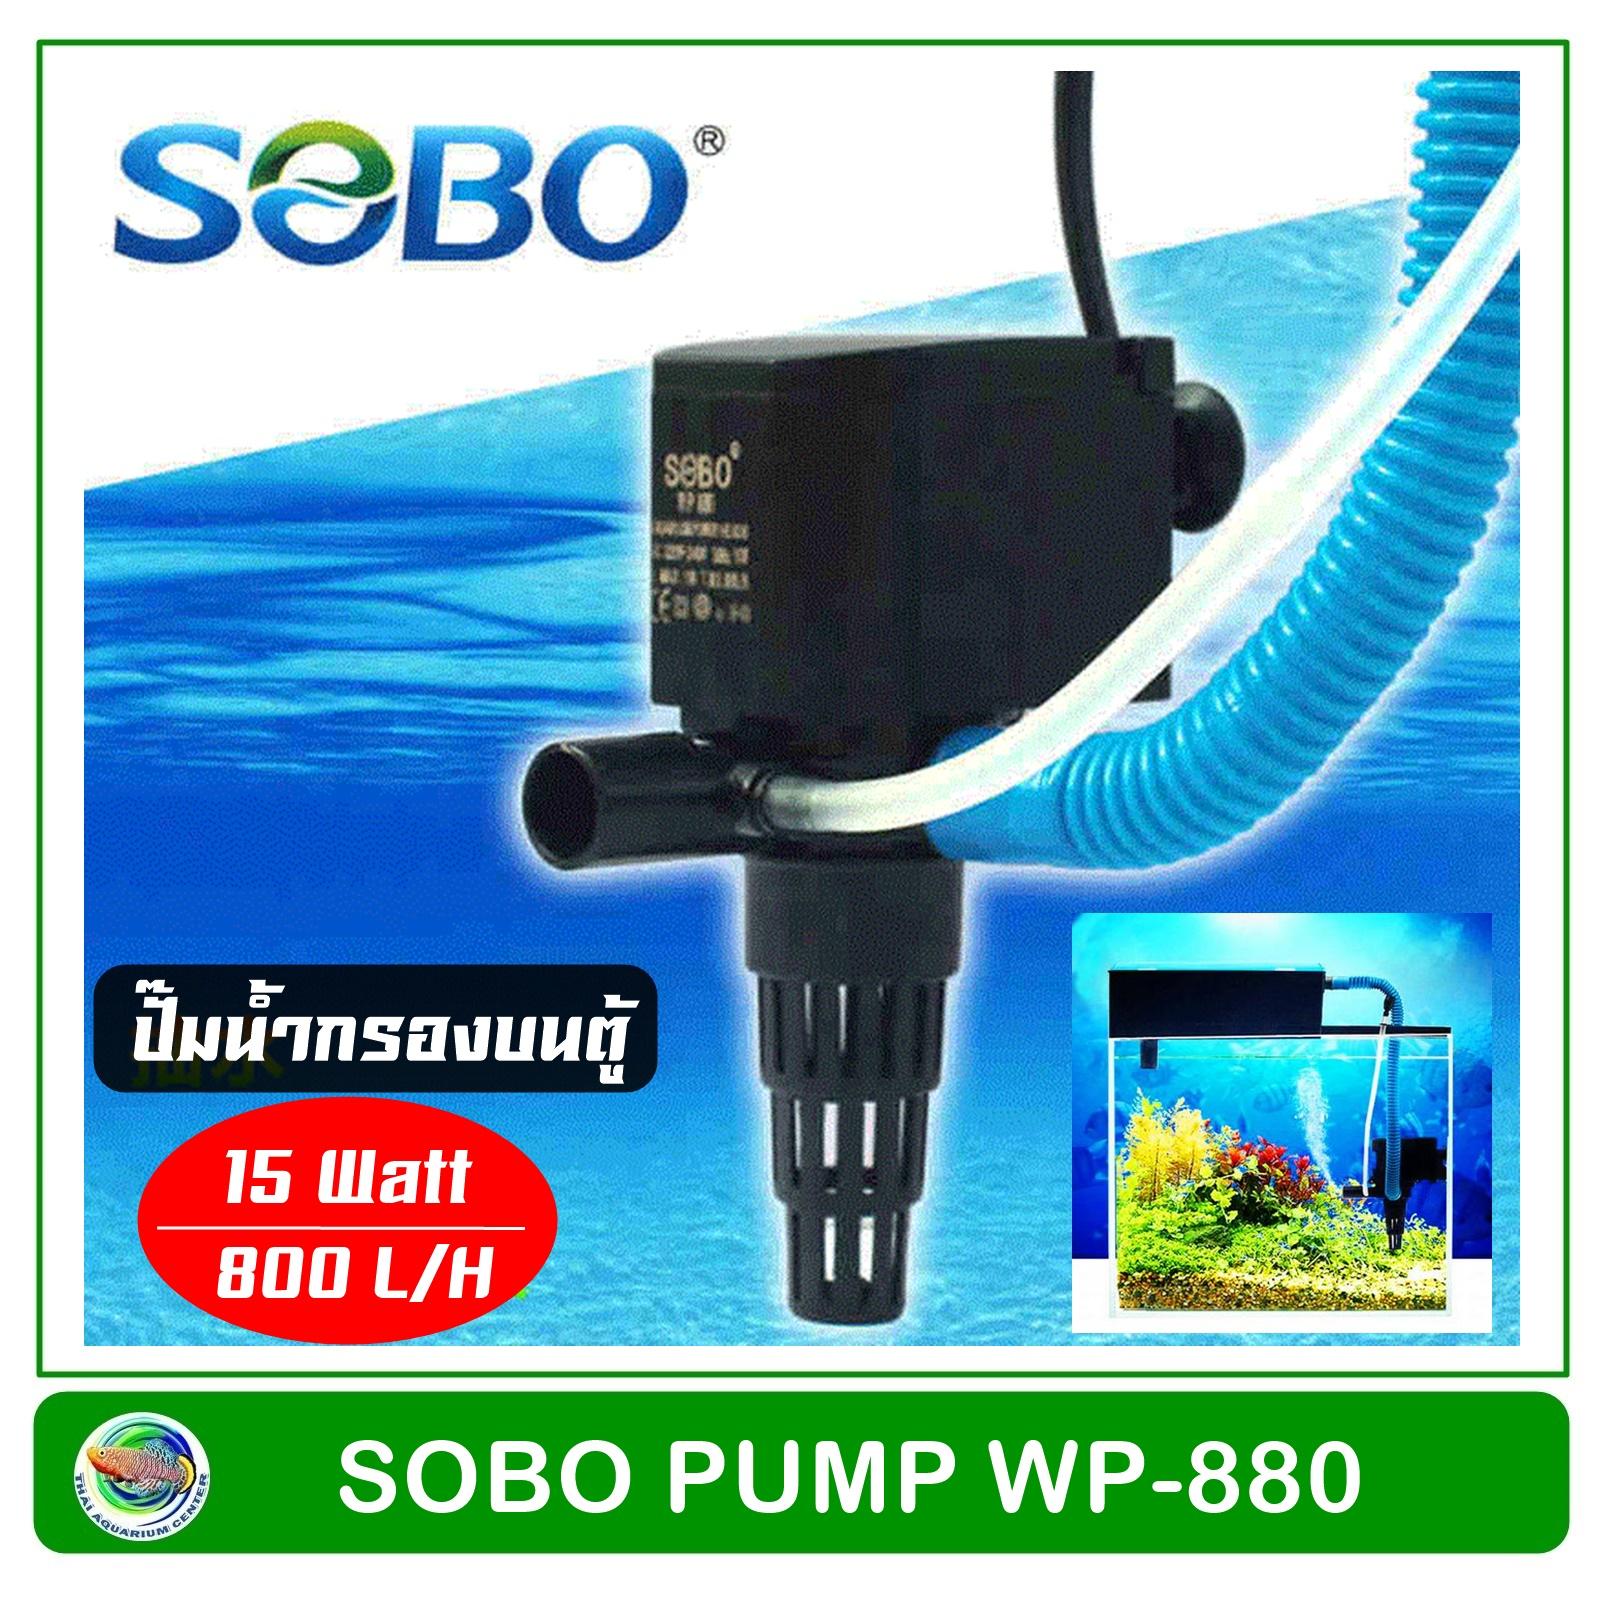 SOBO WP-880 ปั้มน้ำตู้ปลา บ่อปลา 15w 800 L/H ปั๊มน้ำกรองบนตู้ รุ่น Sobo WP-880F